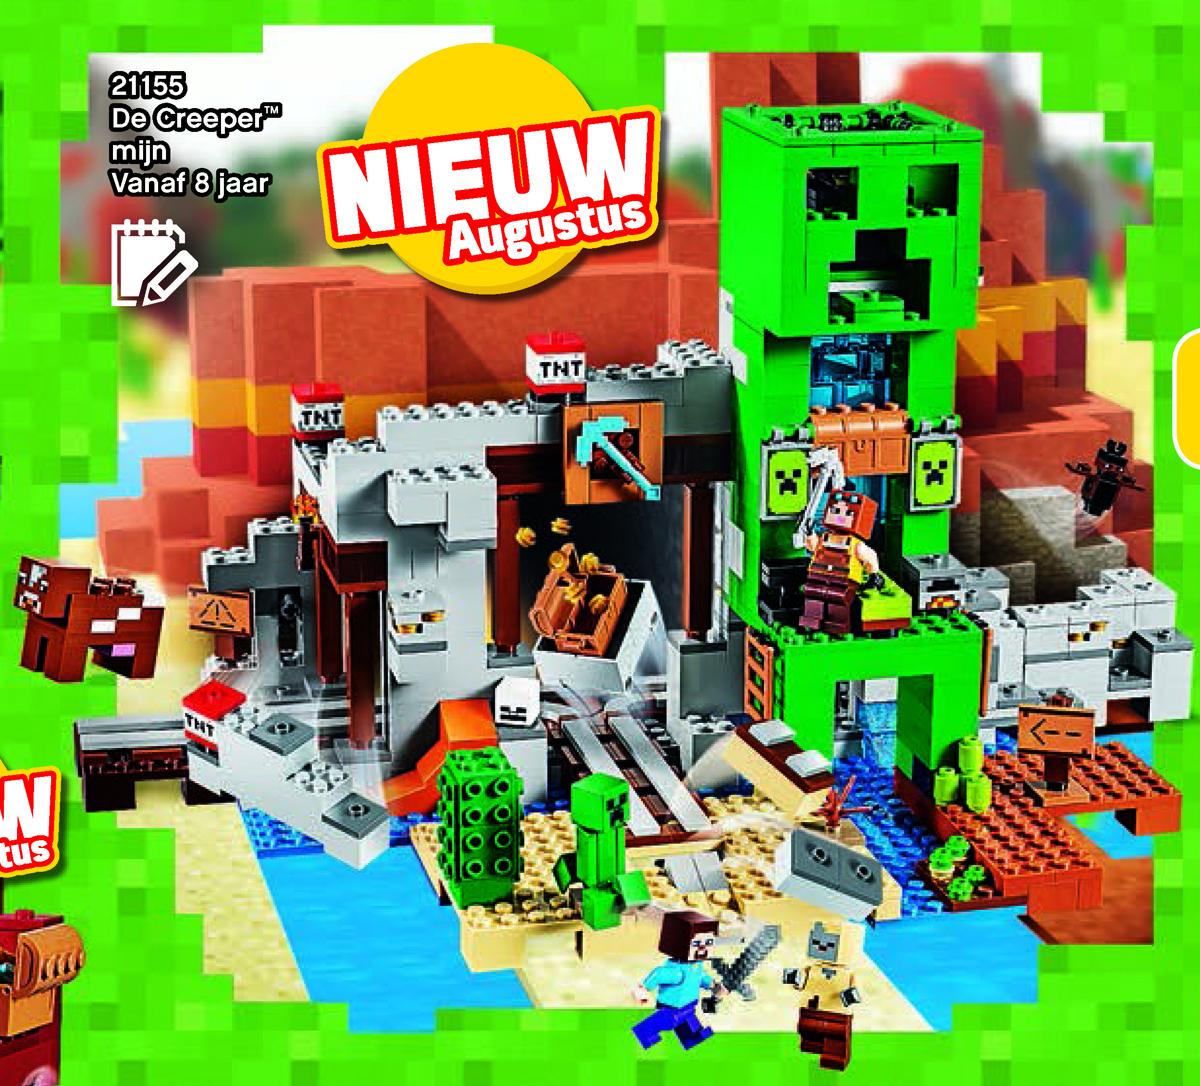 New Lego Minecraft Sets 2020 More 2019 LEGO Minecraft Sets Revealed